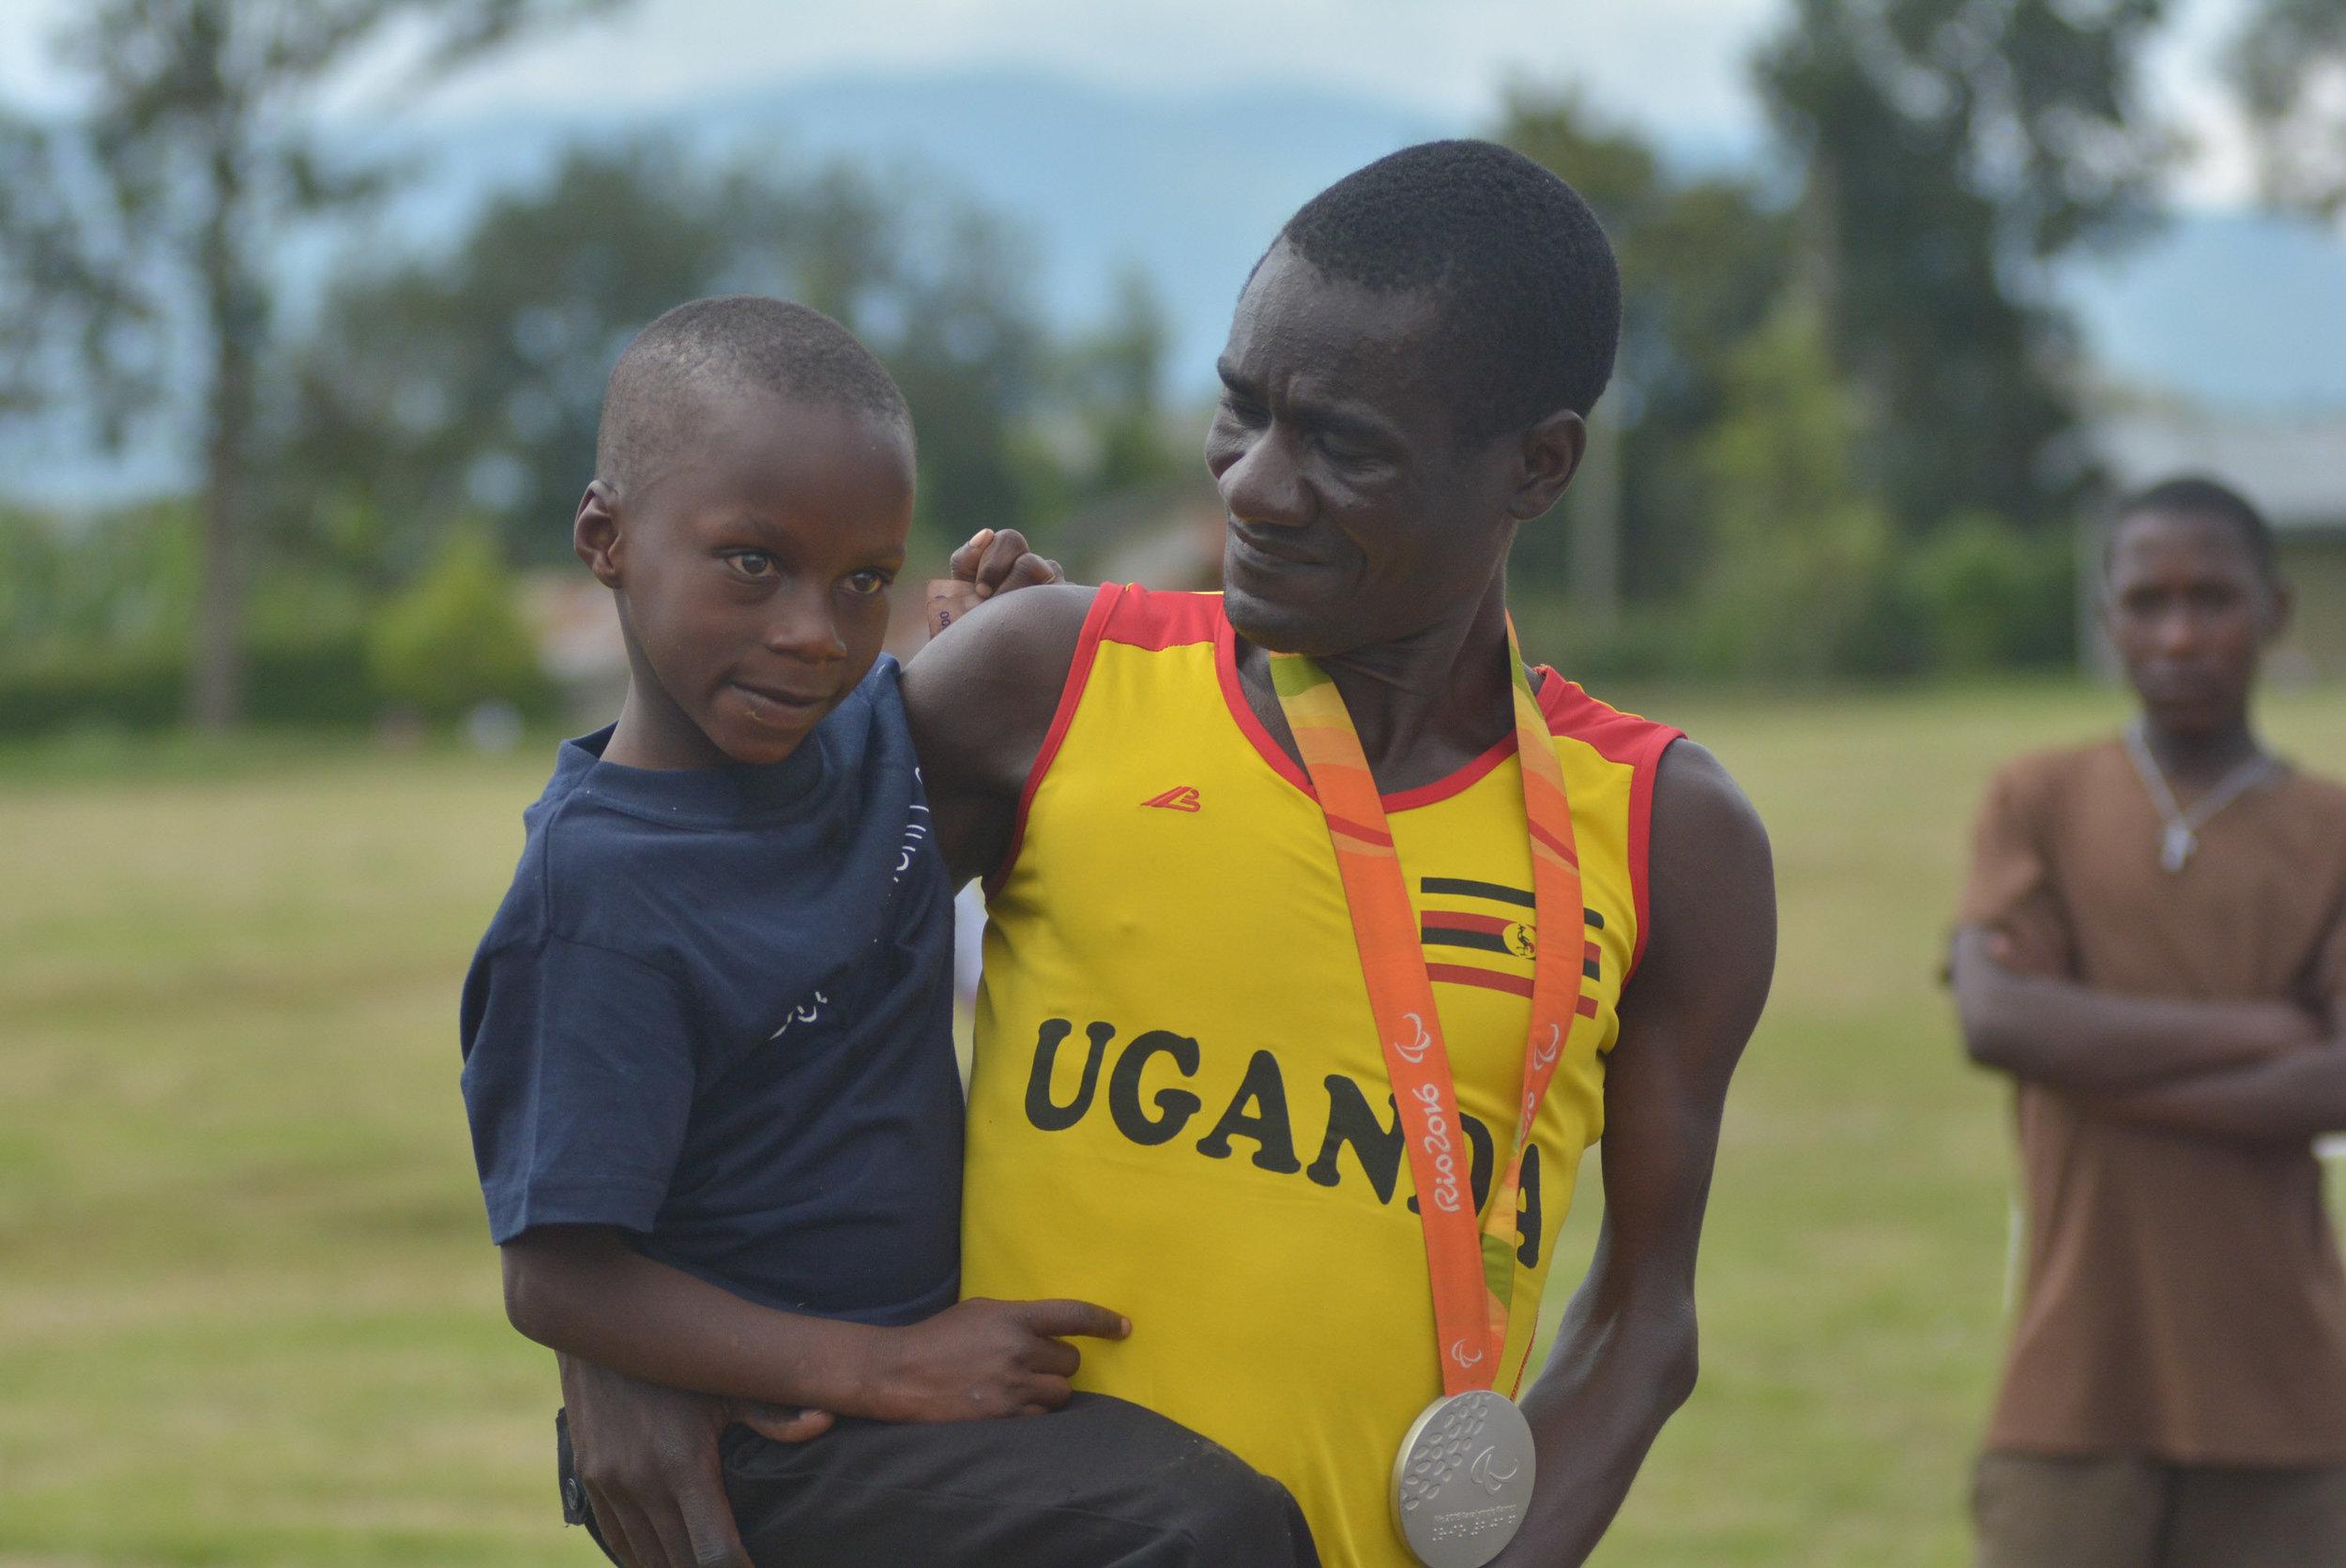 Charity Marathon, Uganda